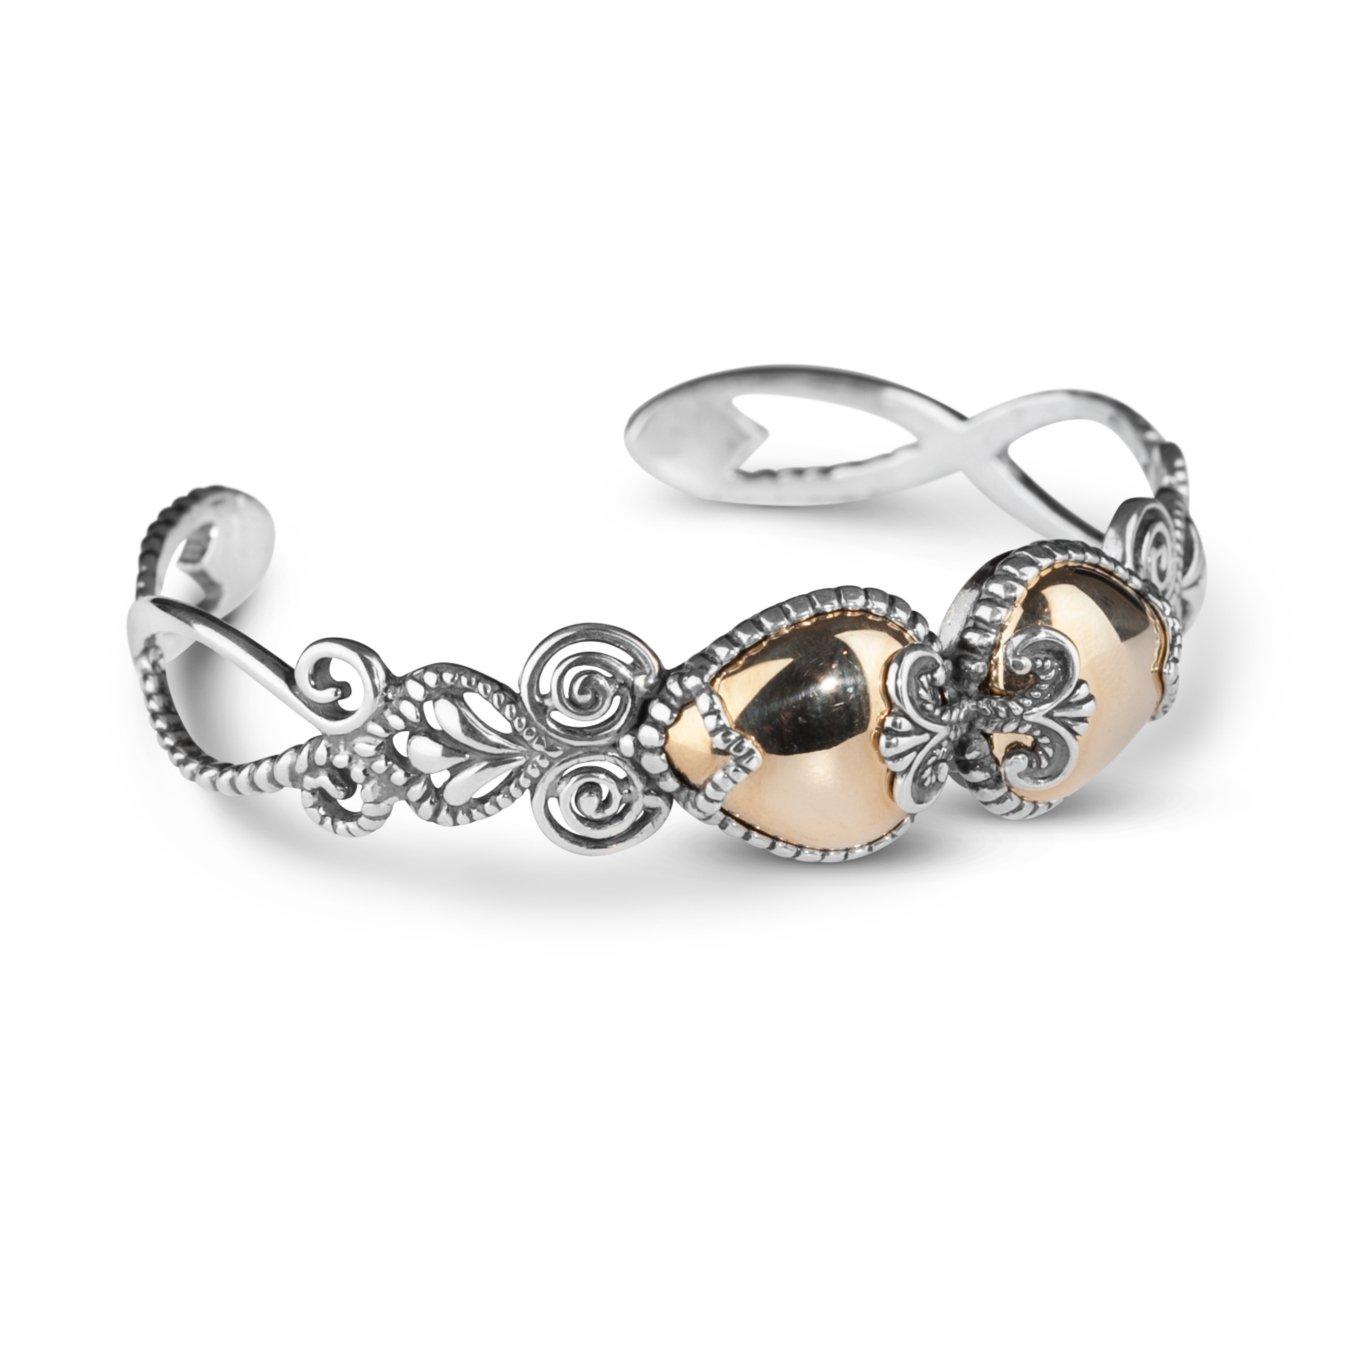 Carolyn Pollack Sterling Silver Brass Cuff Bracelet, Small